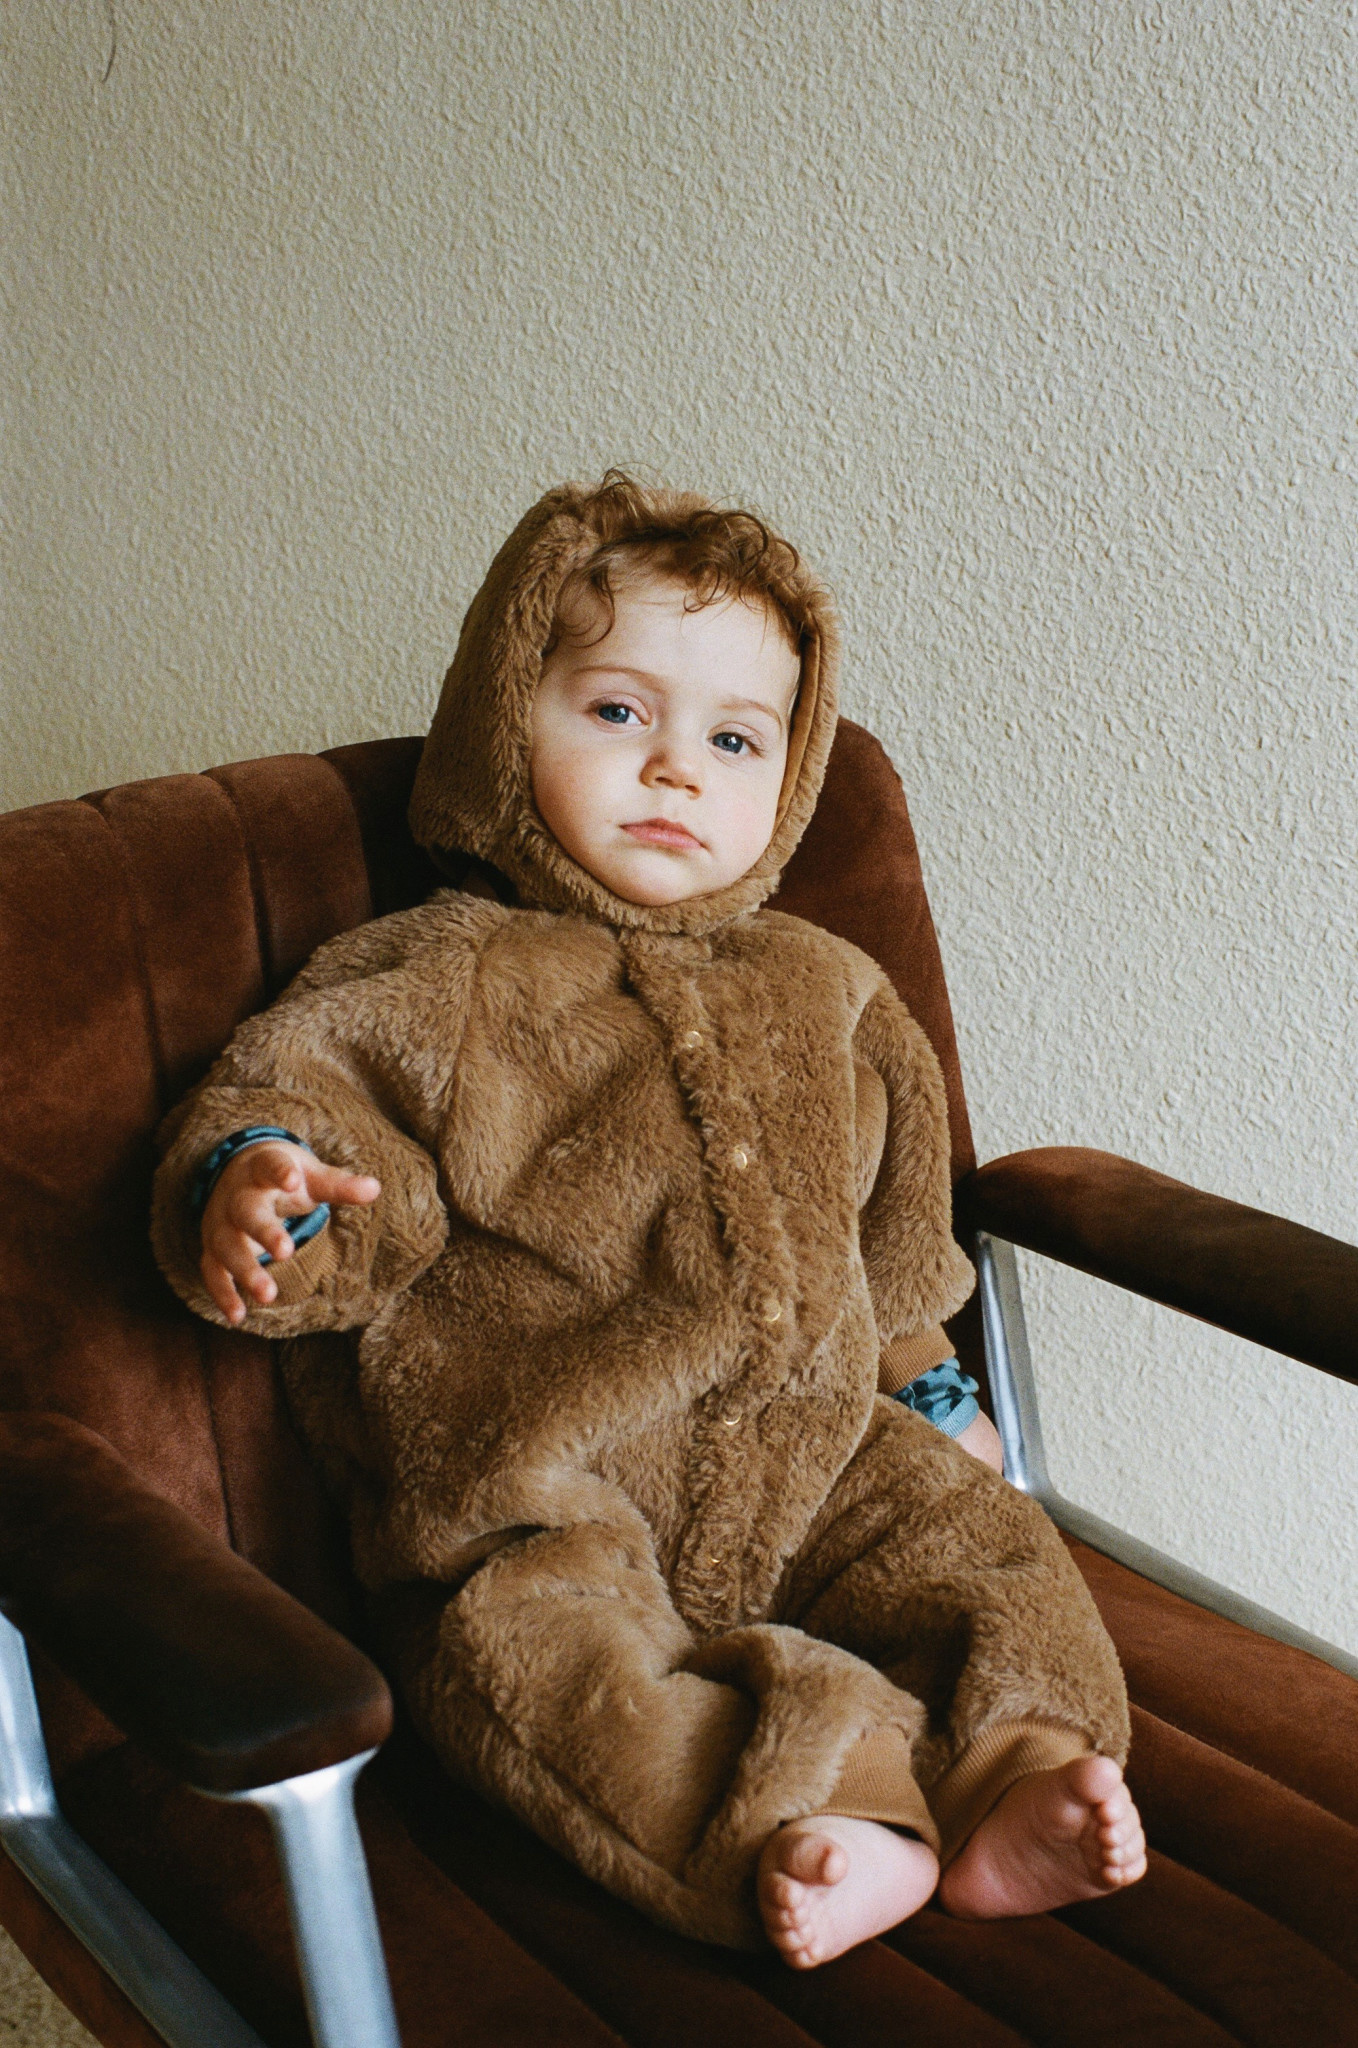 Maed For mini Maed for mini - Baby hat sleepy sloth